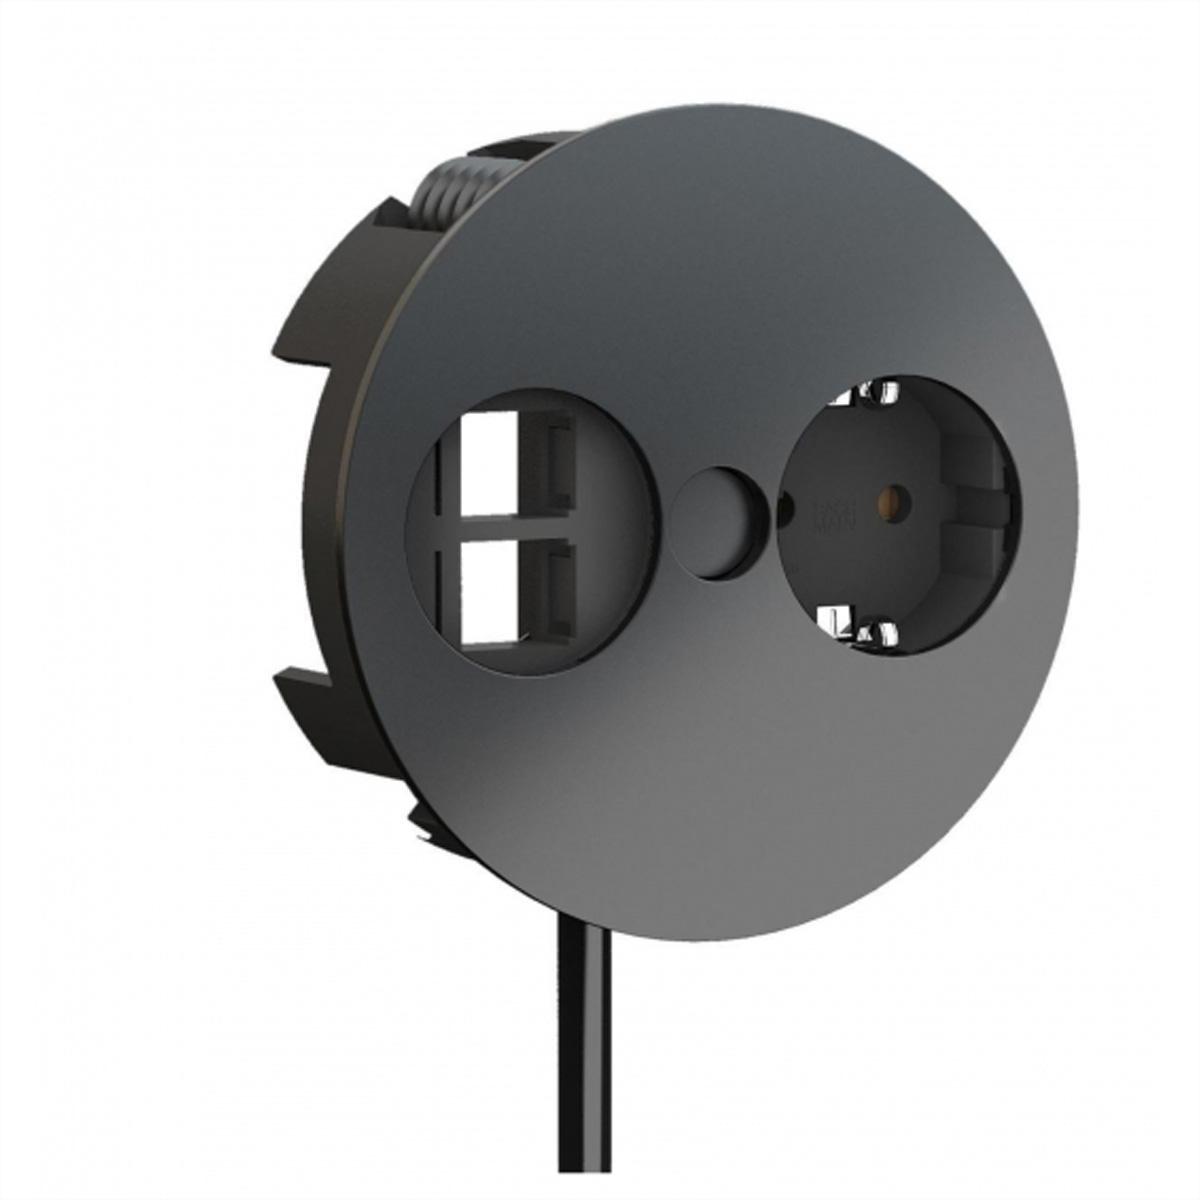 prodigital Bu. Bu. cavo IEC 320-C14 7,5 cm black - Schuko